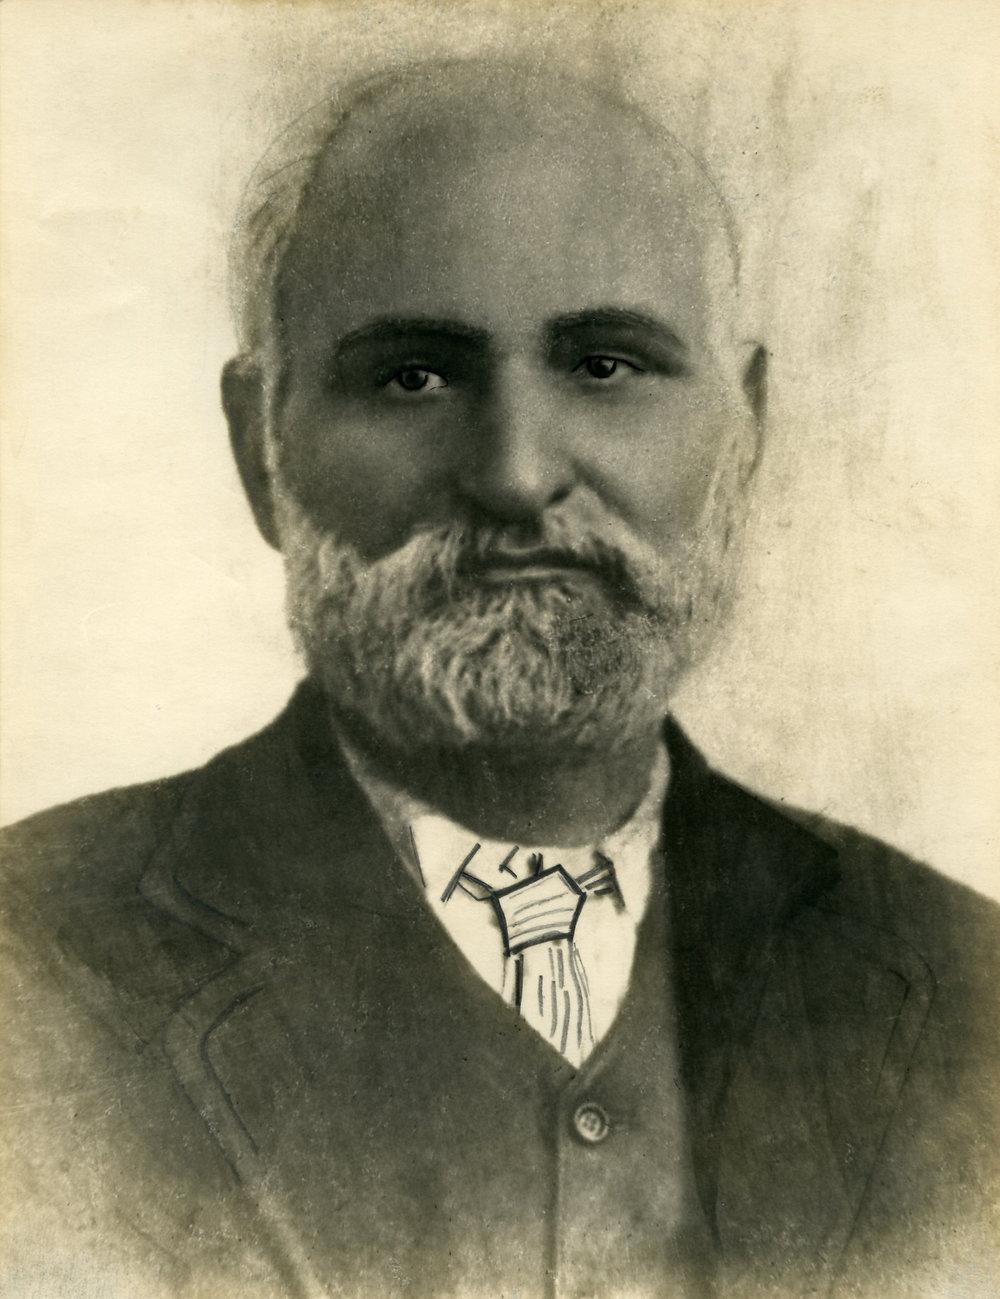 Khawaja Mohammad Bux: Tammy's great-grandfather, circa 1920's